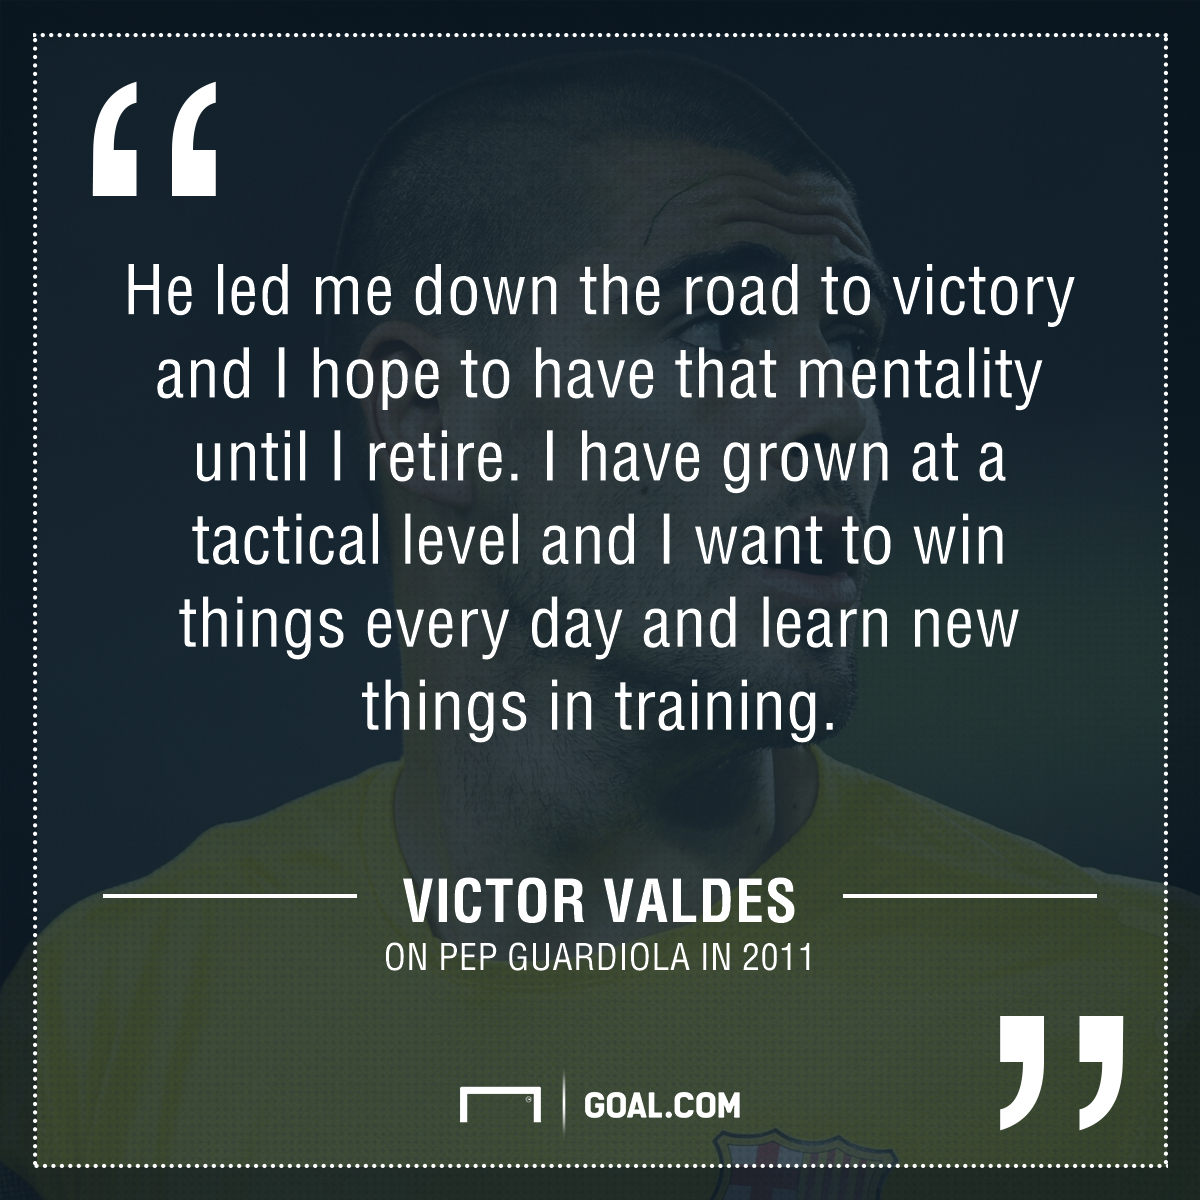 Victor Valdes quote